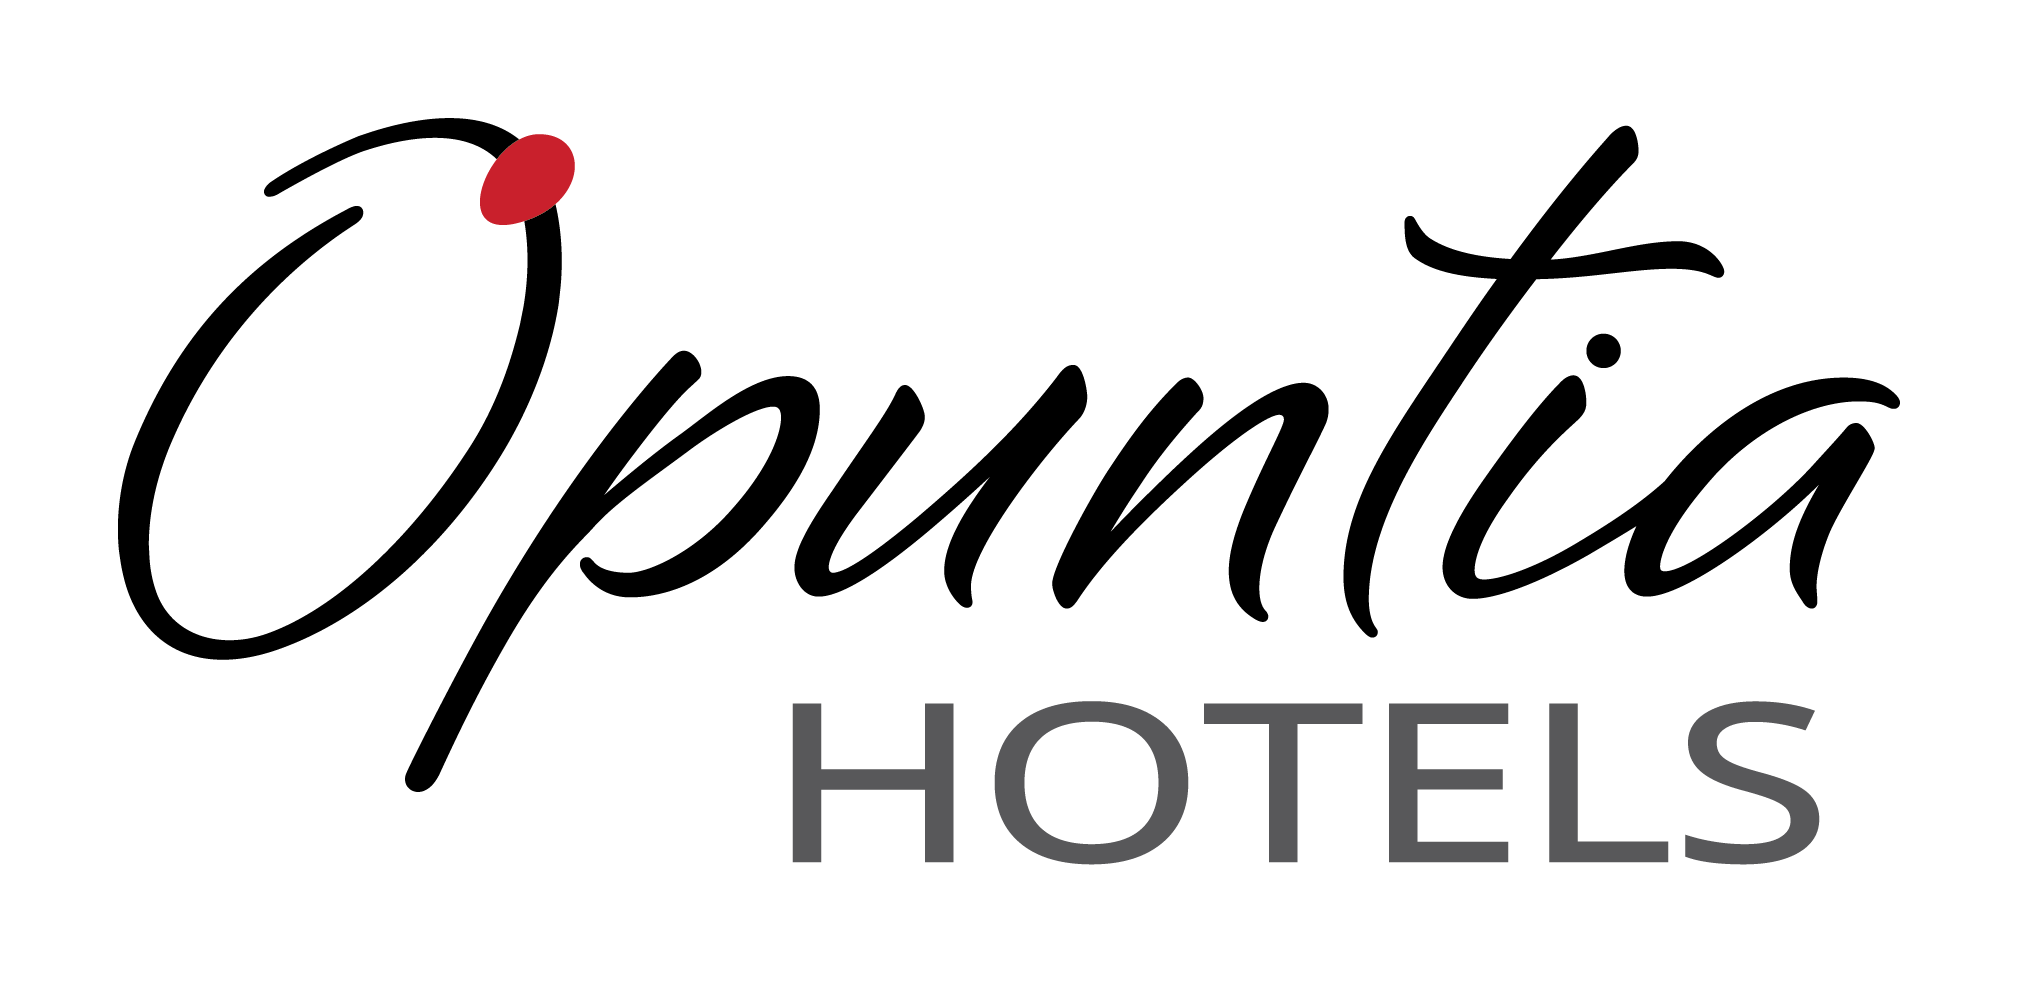 Opuntia Hotel - San Cristobal - Galapagos